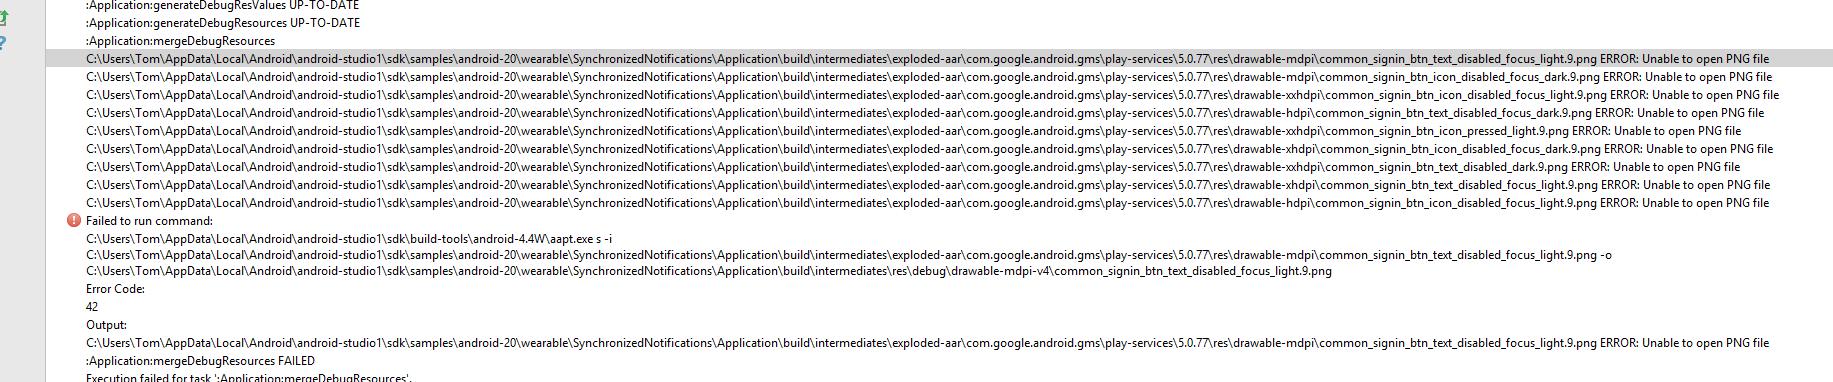 Android Studio Wear App Error.